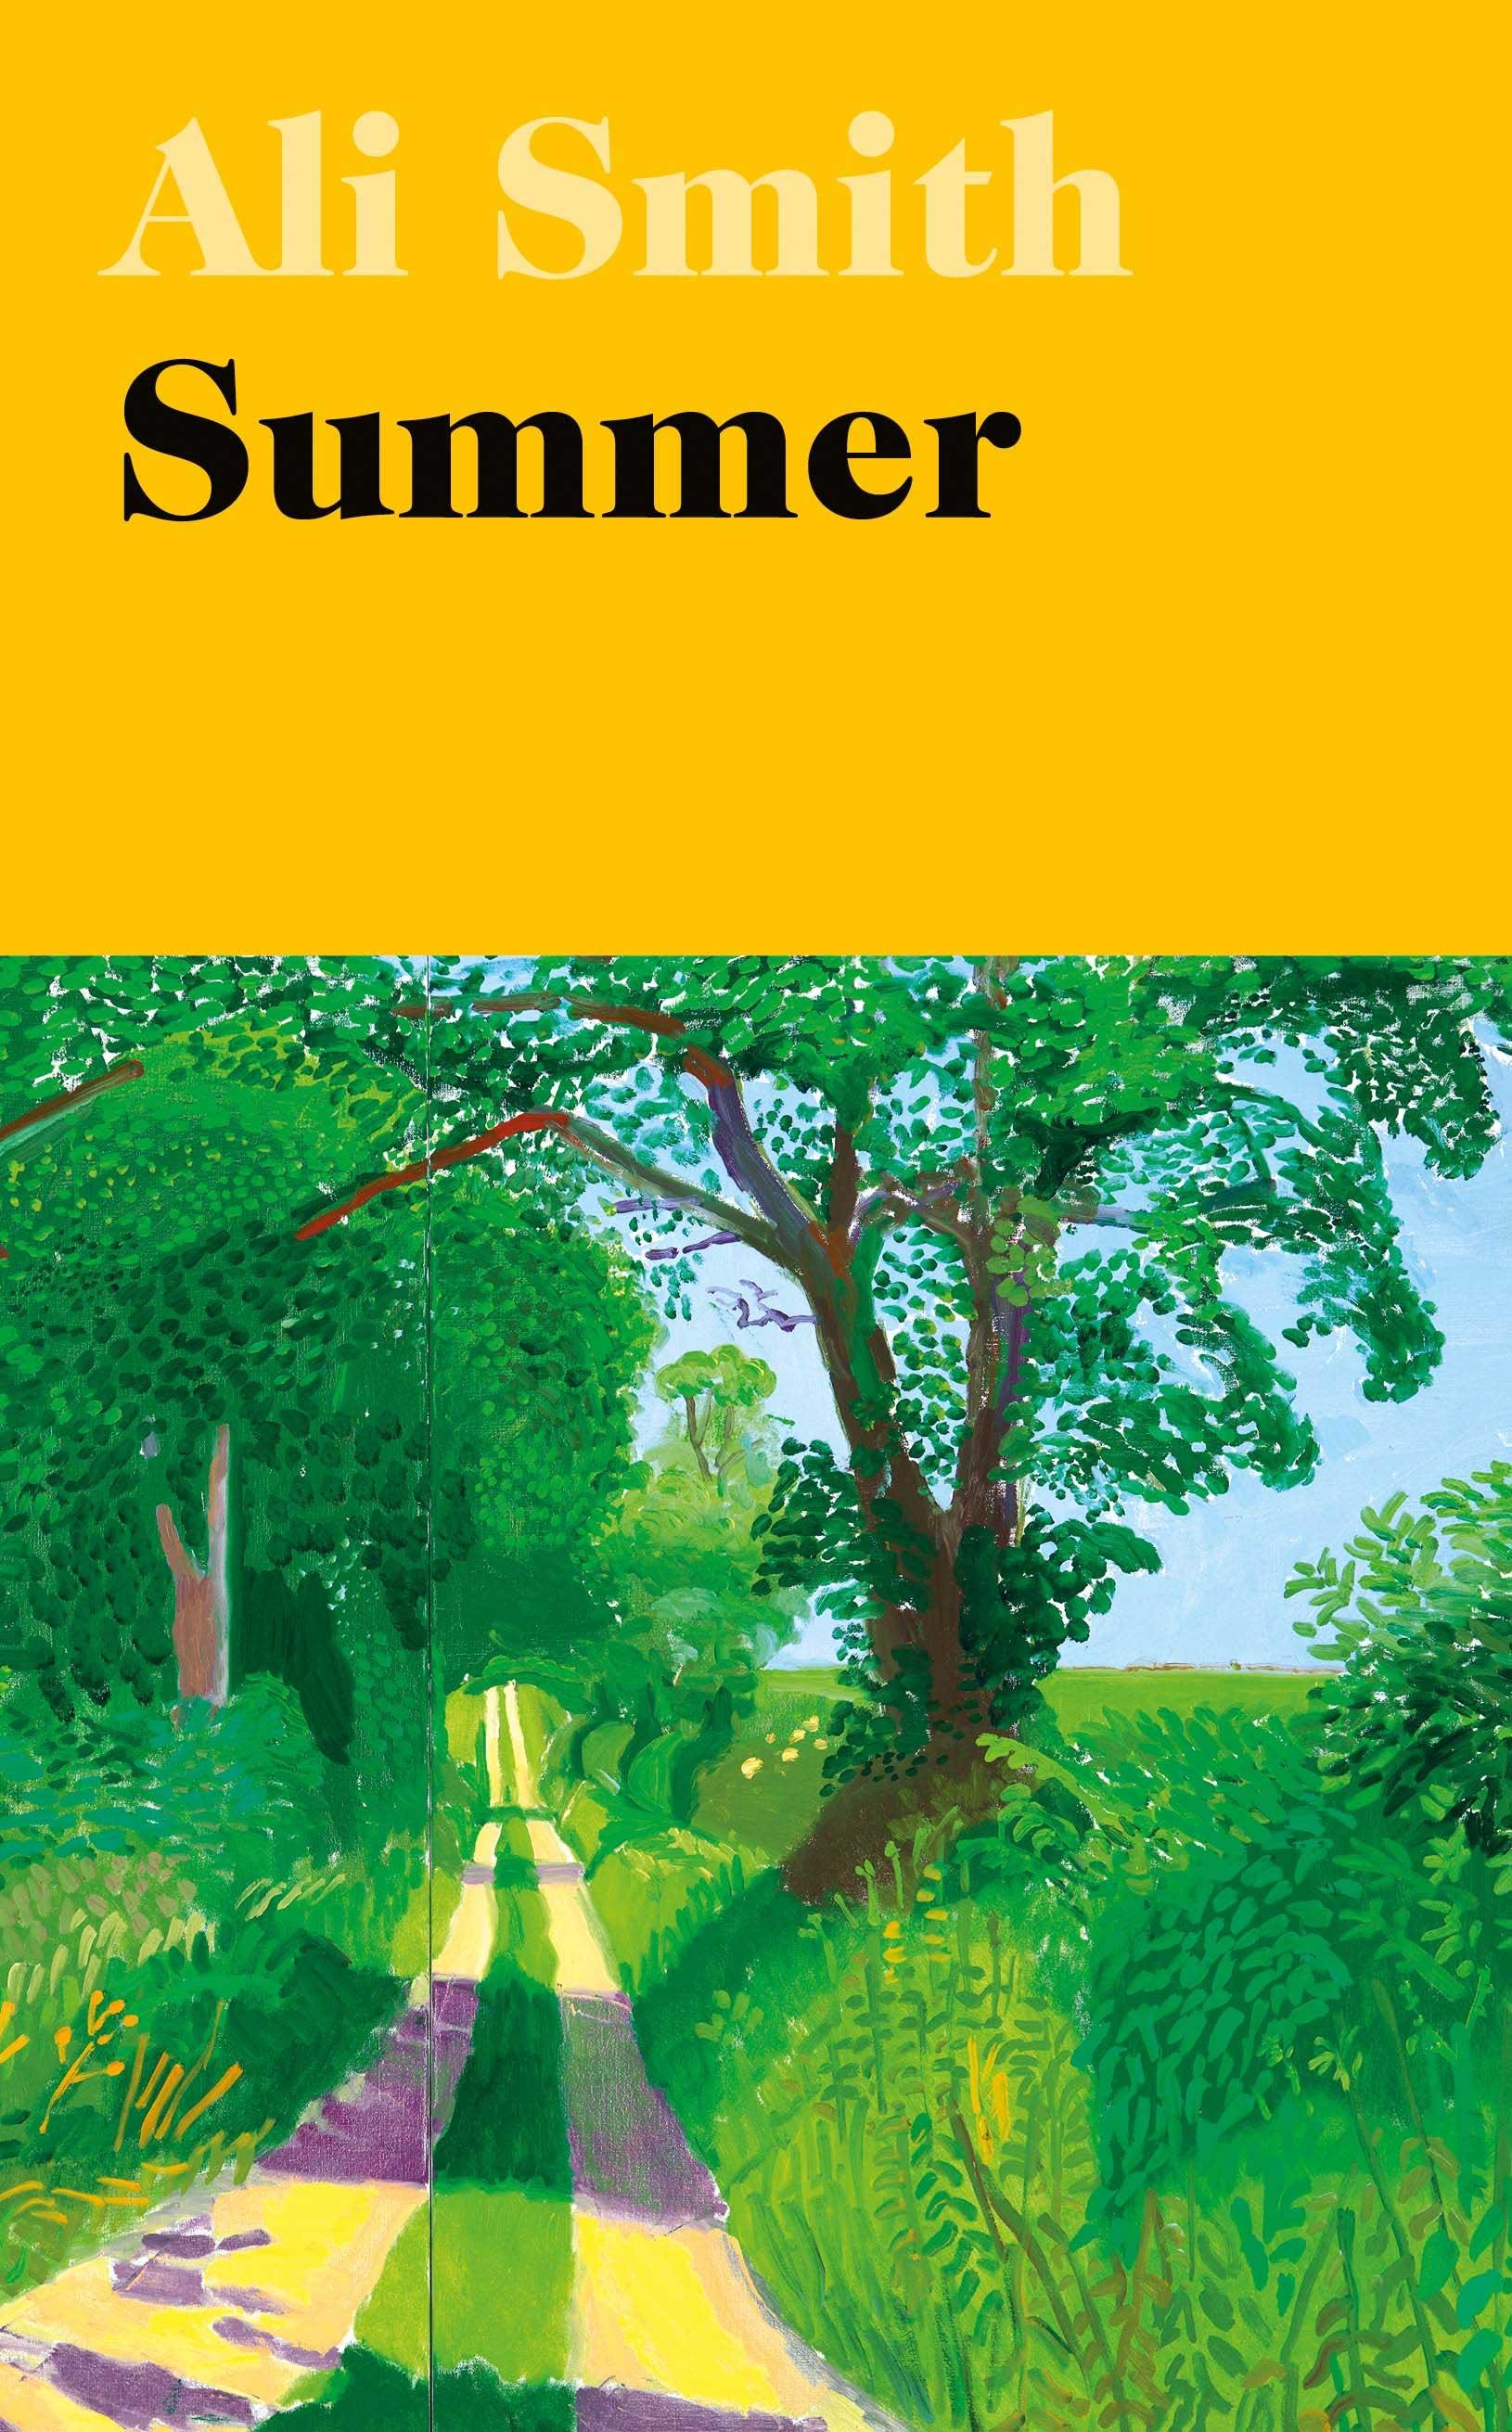 Summer byAli Smith,Hamish Hamilton, Rs 699